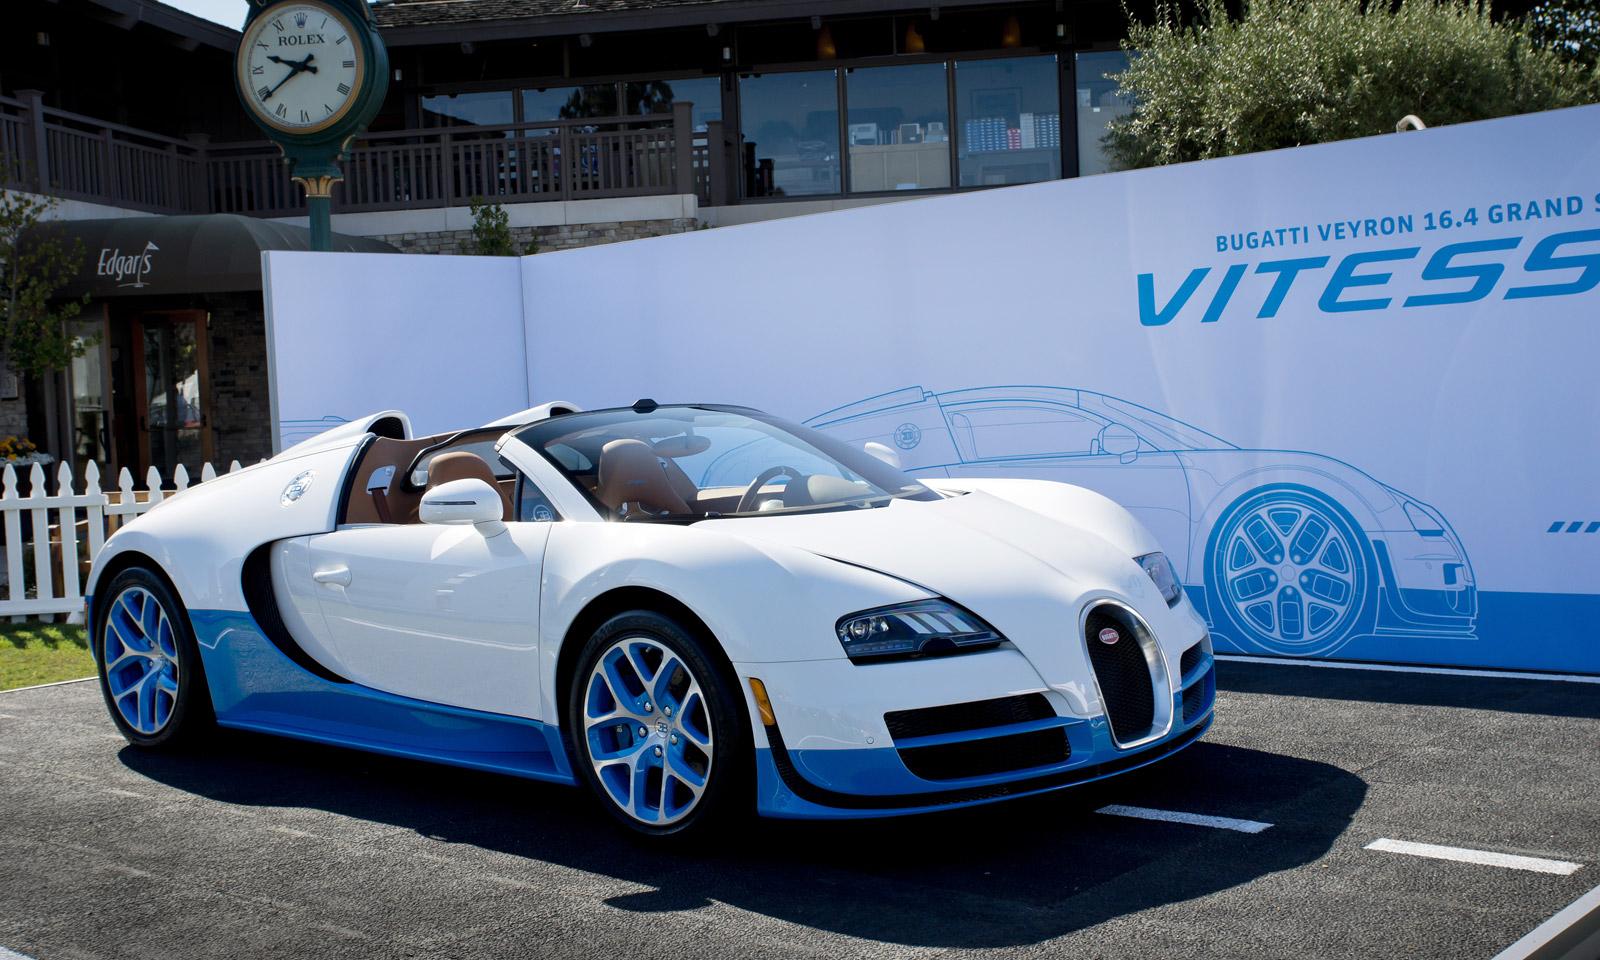 test drive grand new veloz 1.3 dimensi all kijang innova 2016 special edition bugatti veyron sport vitesse at